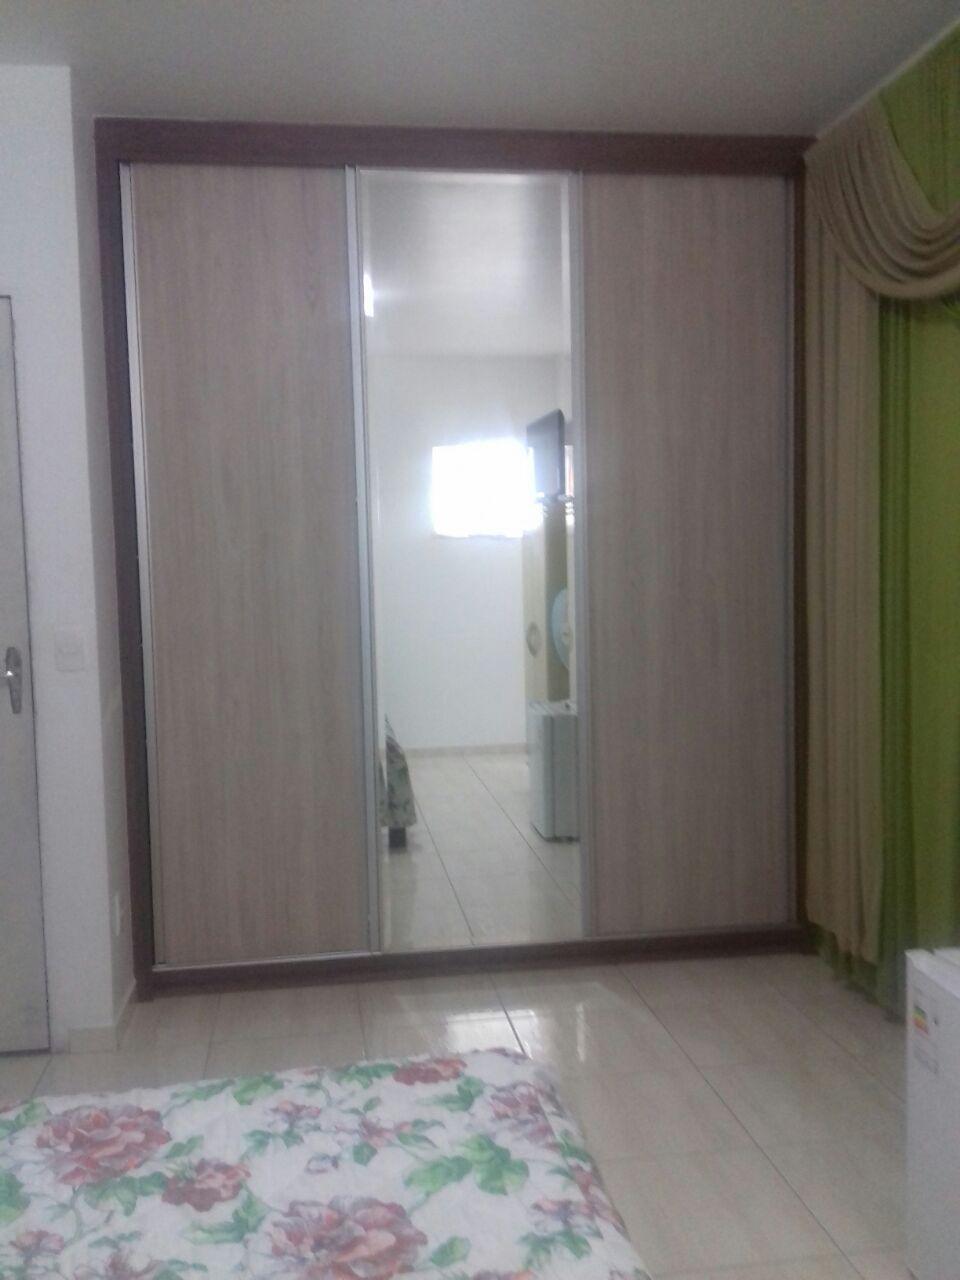 Armario Para Quarto Planejado : Marcenaria movel planejado armario de quarto porta